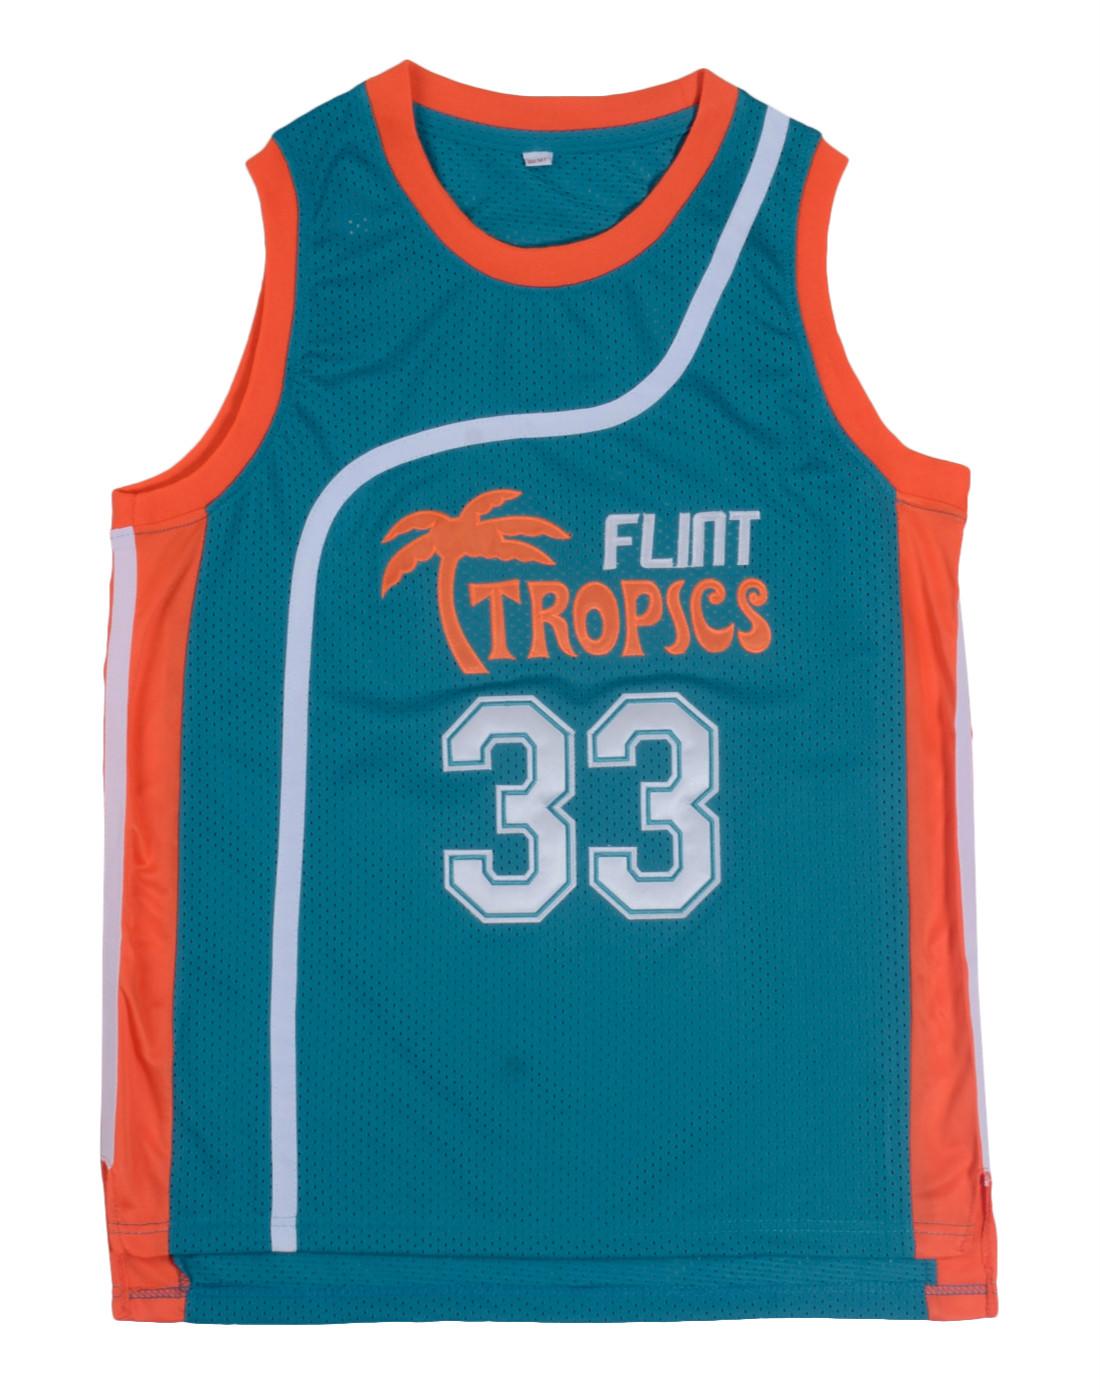 00e0ca333 Jackie Moon Flint Tropical Throwback Jerseys 33# Retro Basketball ...